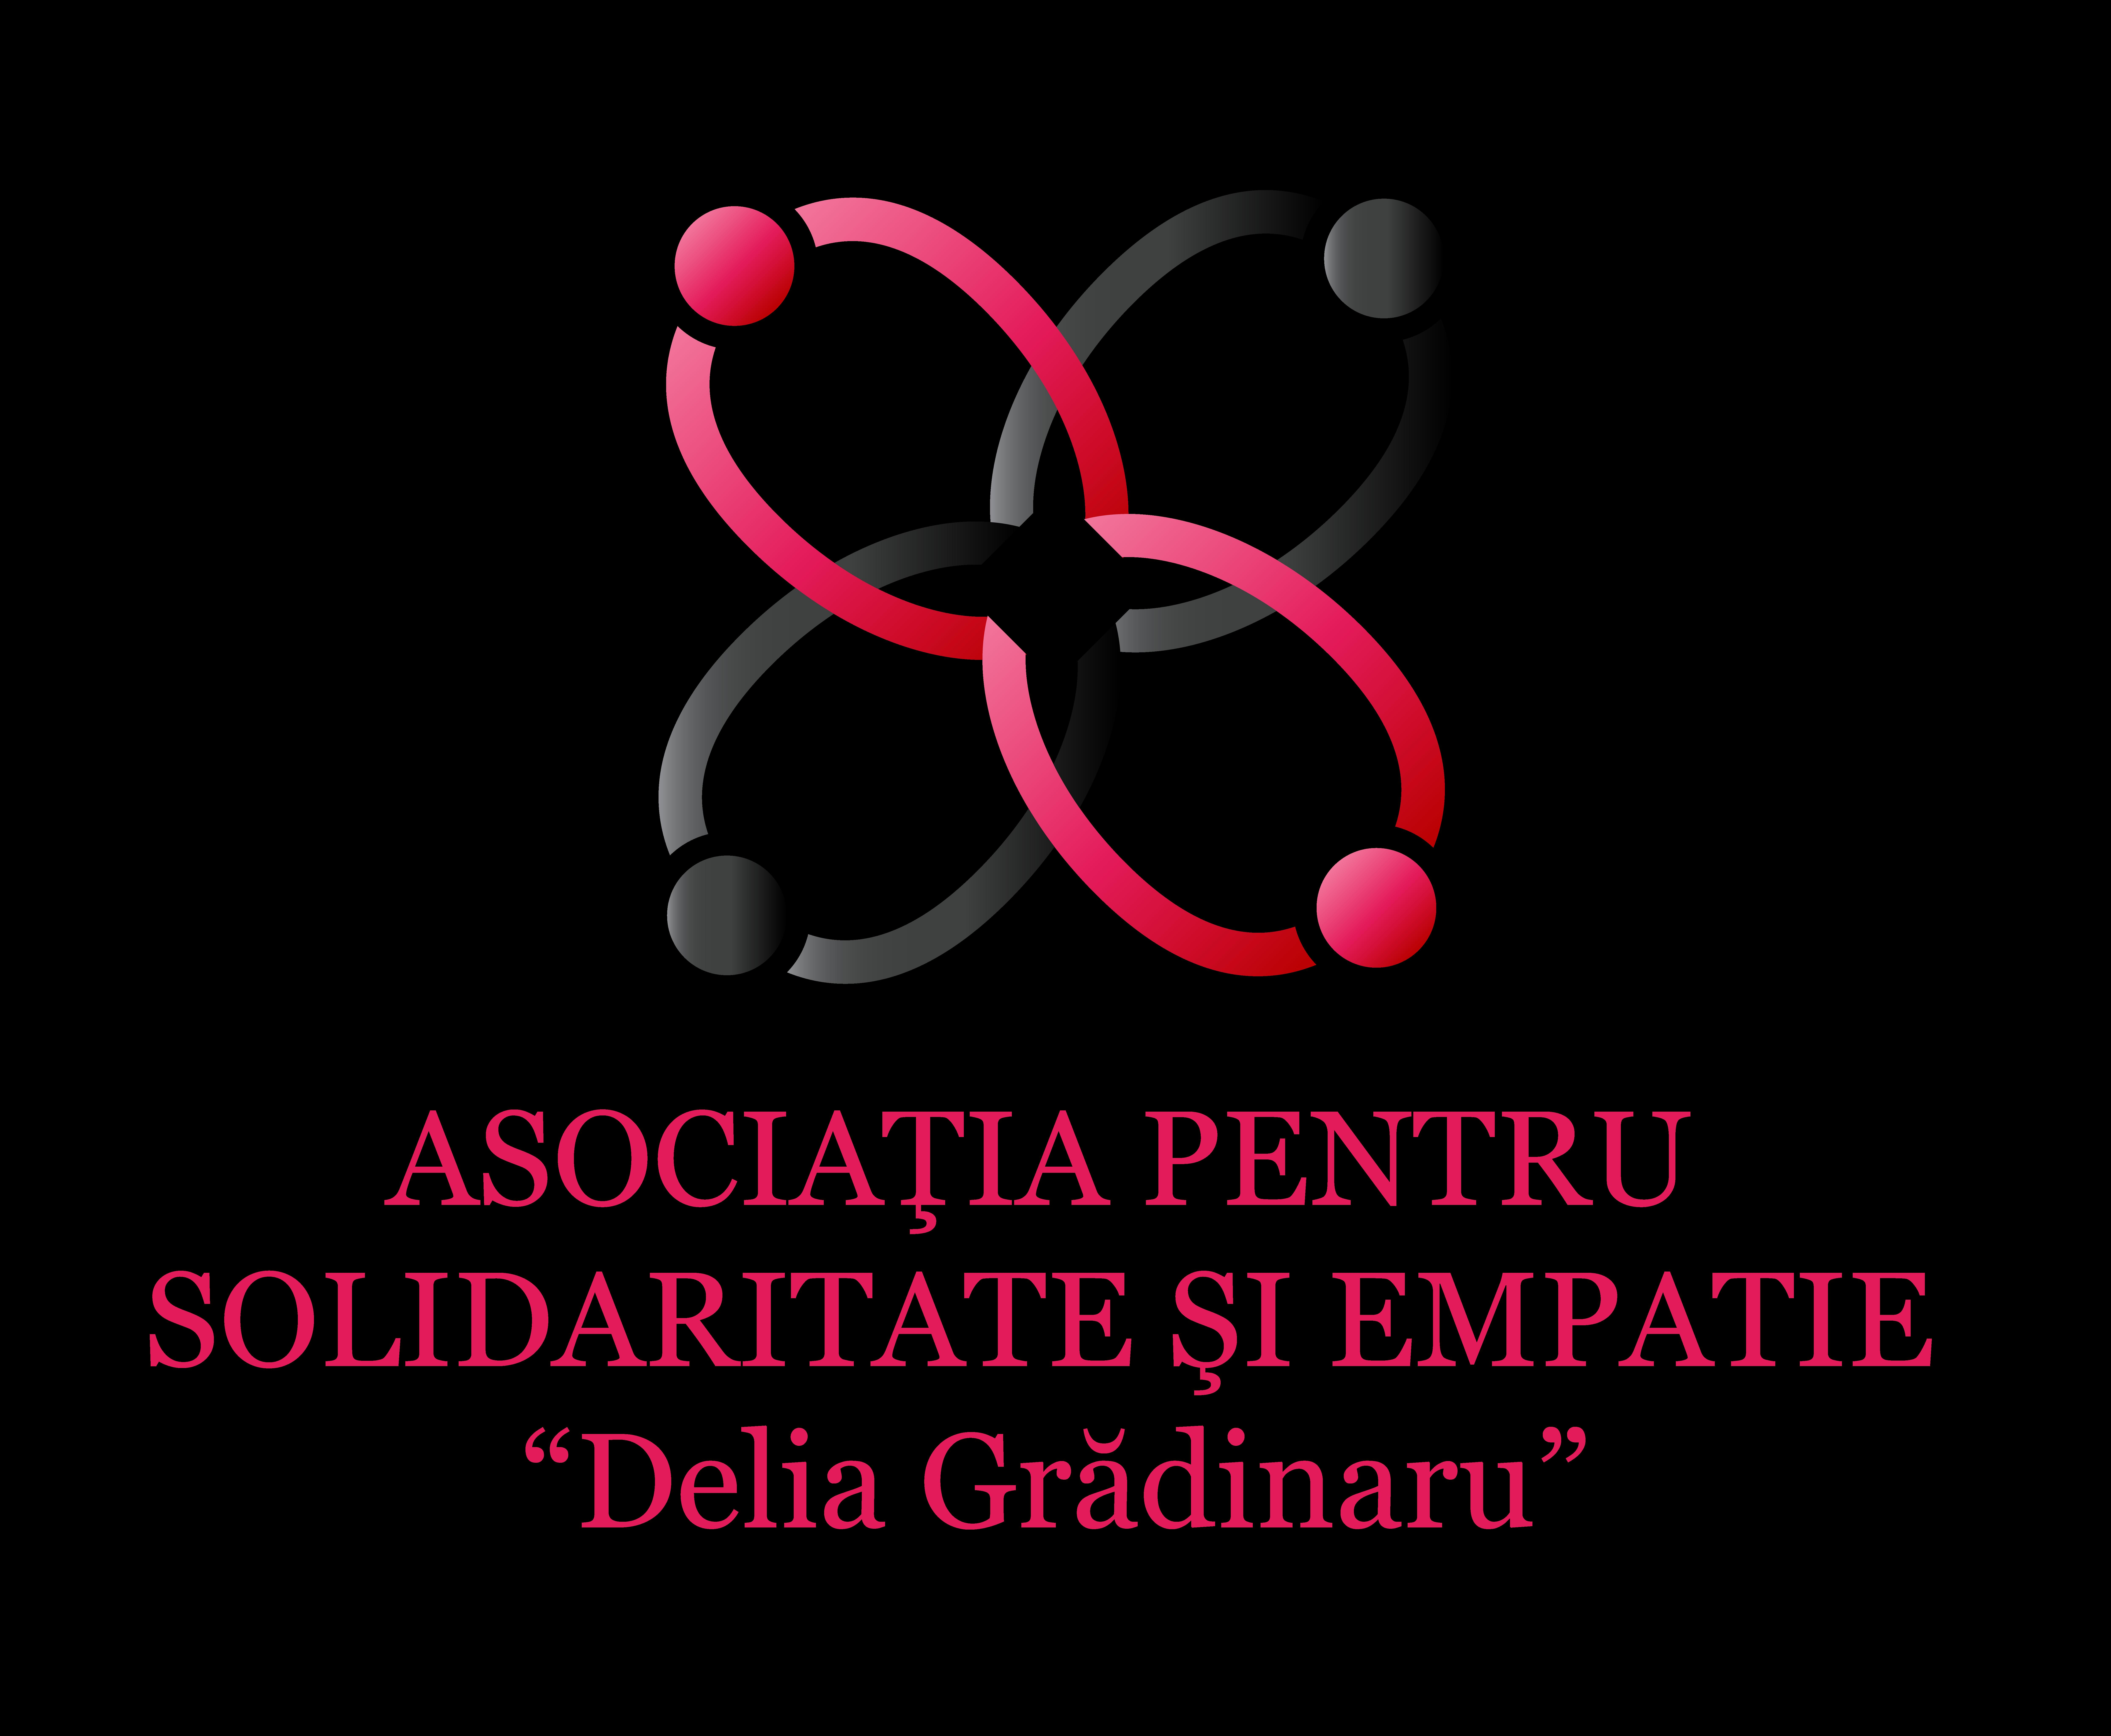 Asociatia pentru Solidaritate si Empatie Delia Gradinaru logo